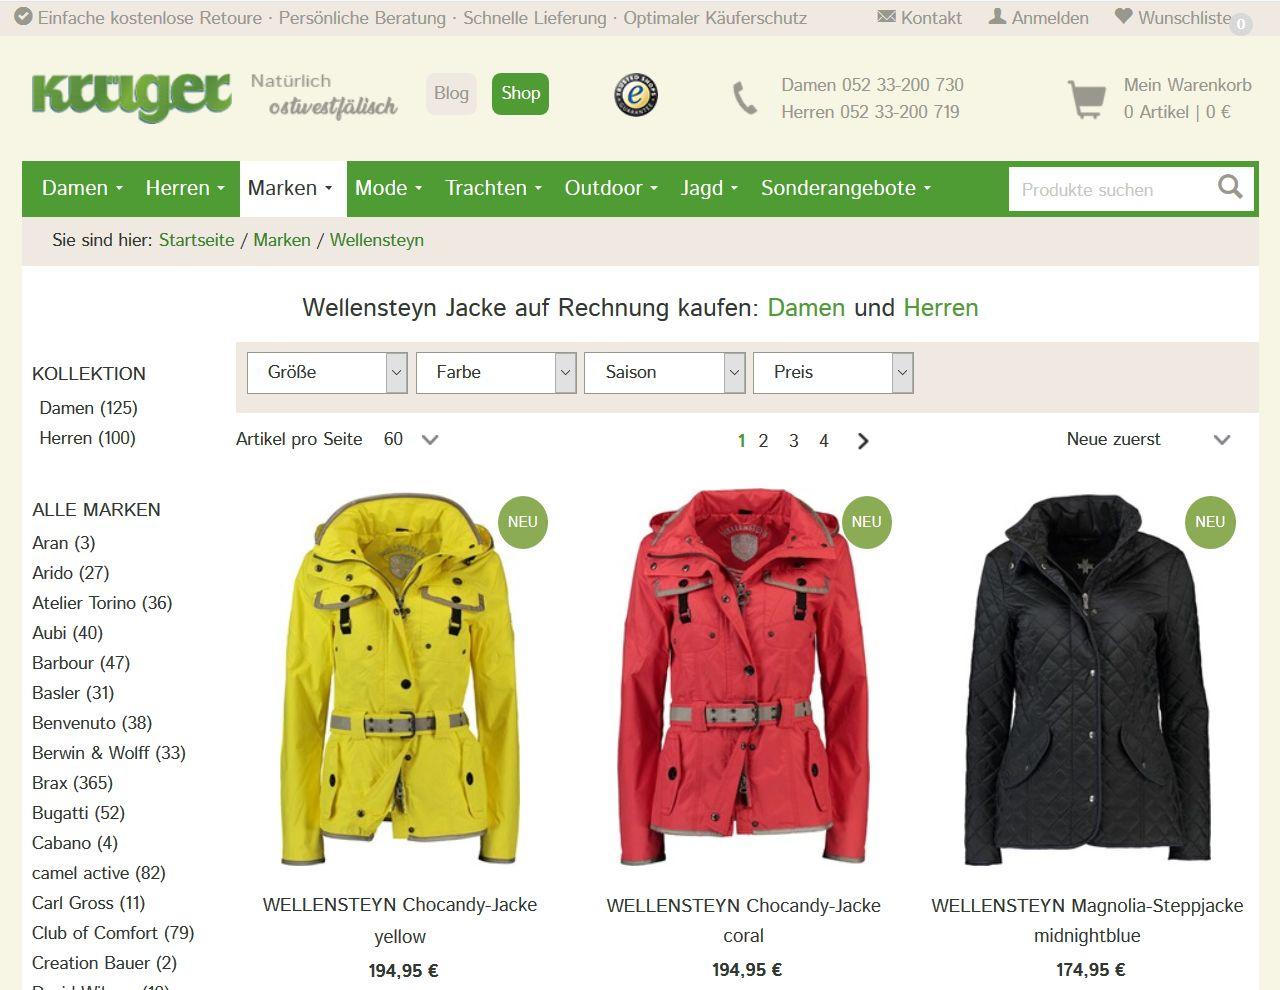 Markenmode günstig online shoppen